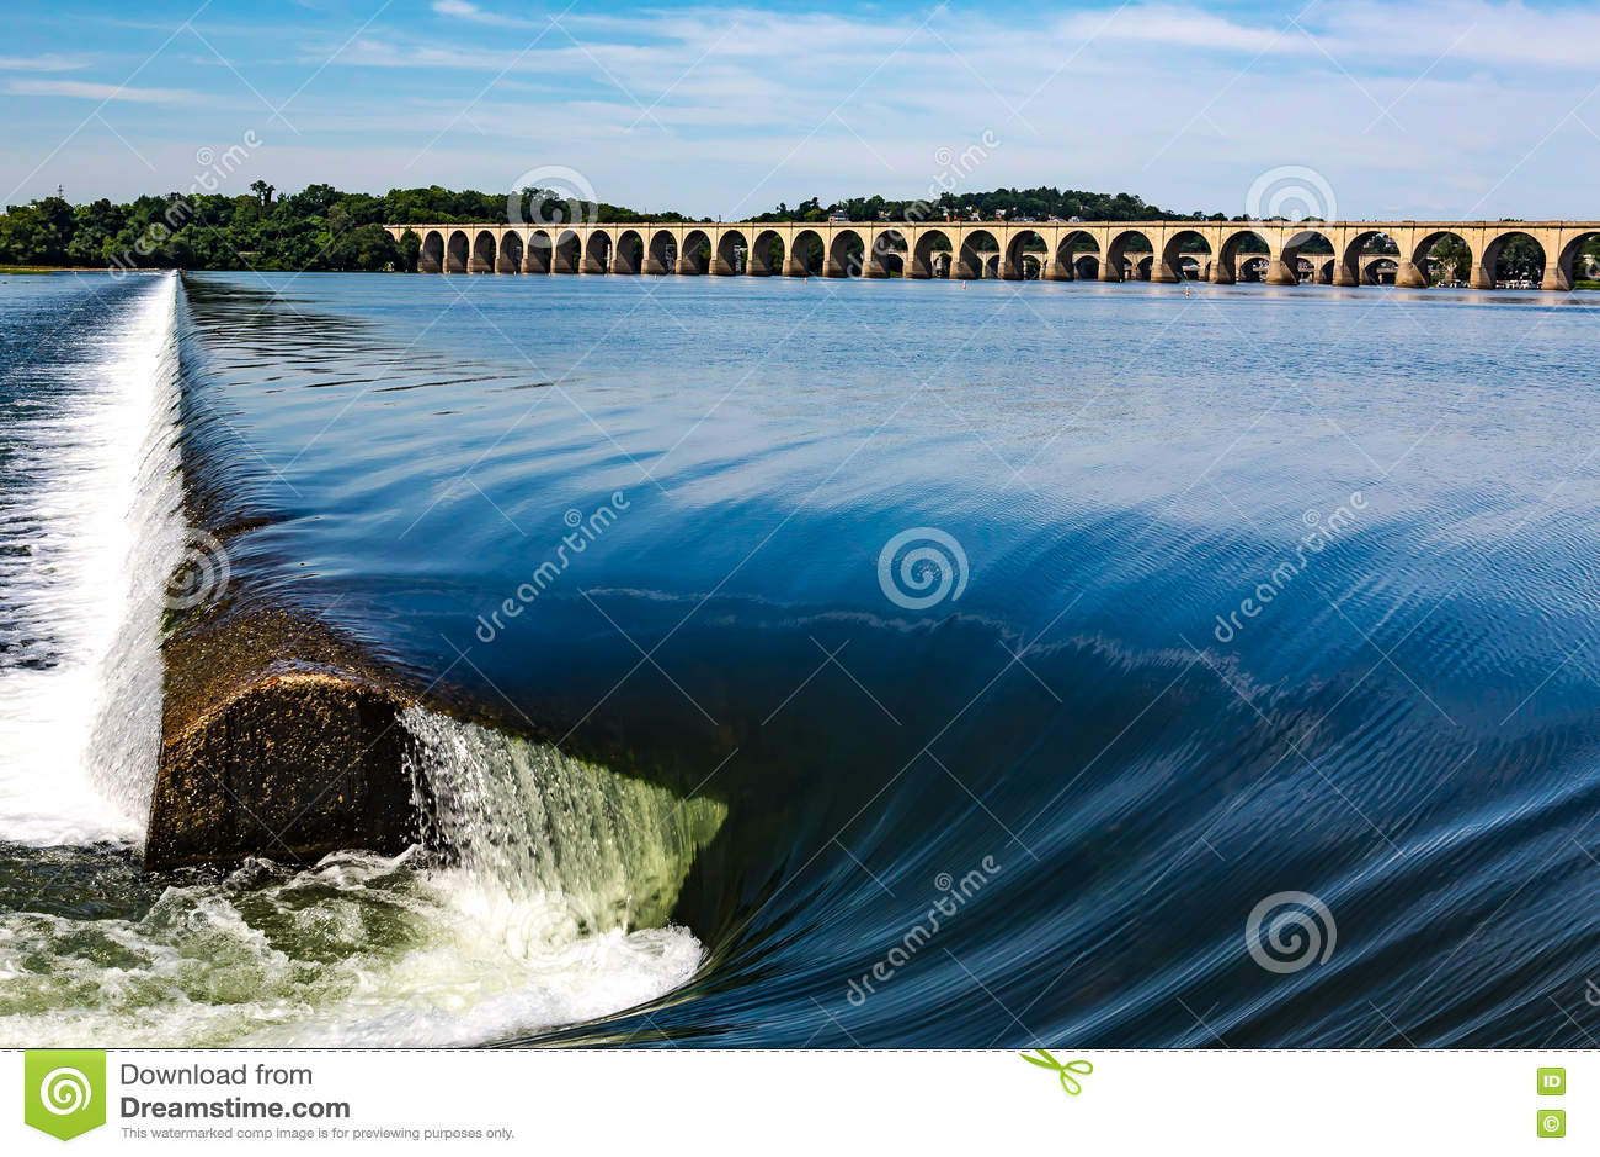 Susquehanna River Dam At Harrisburg Stock Image - Image of